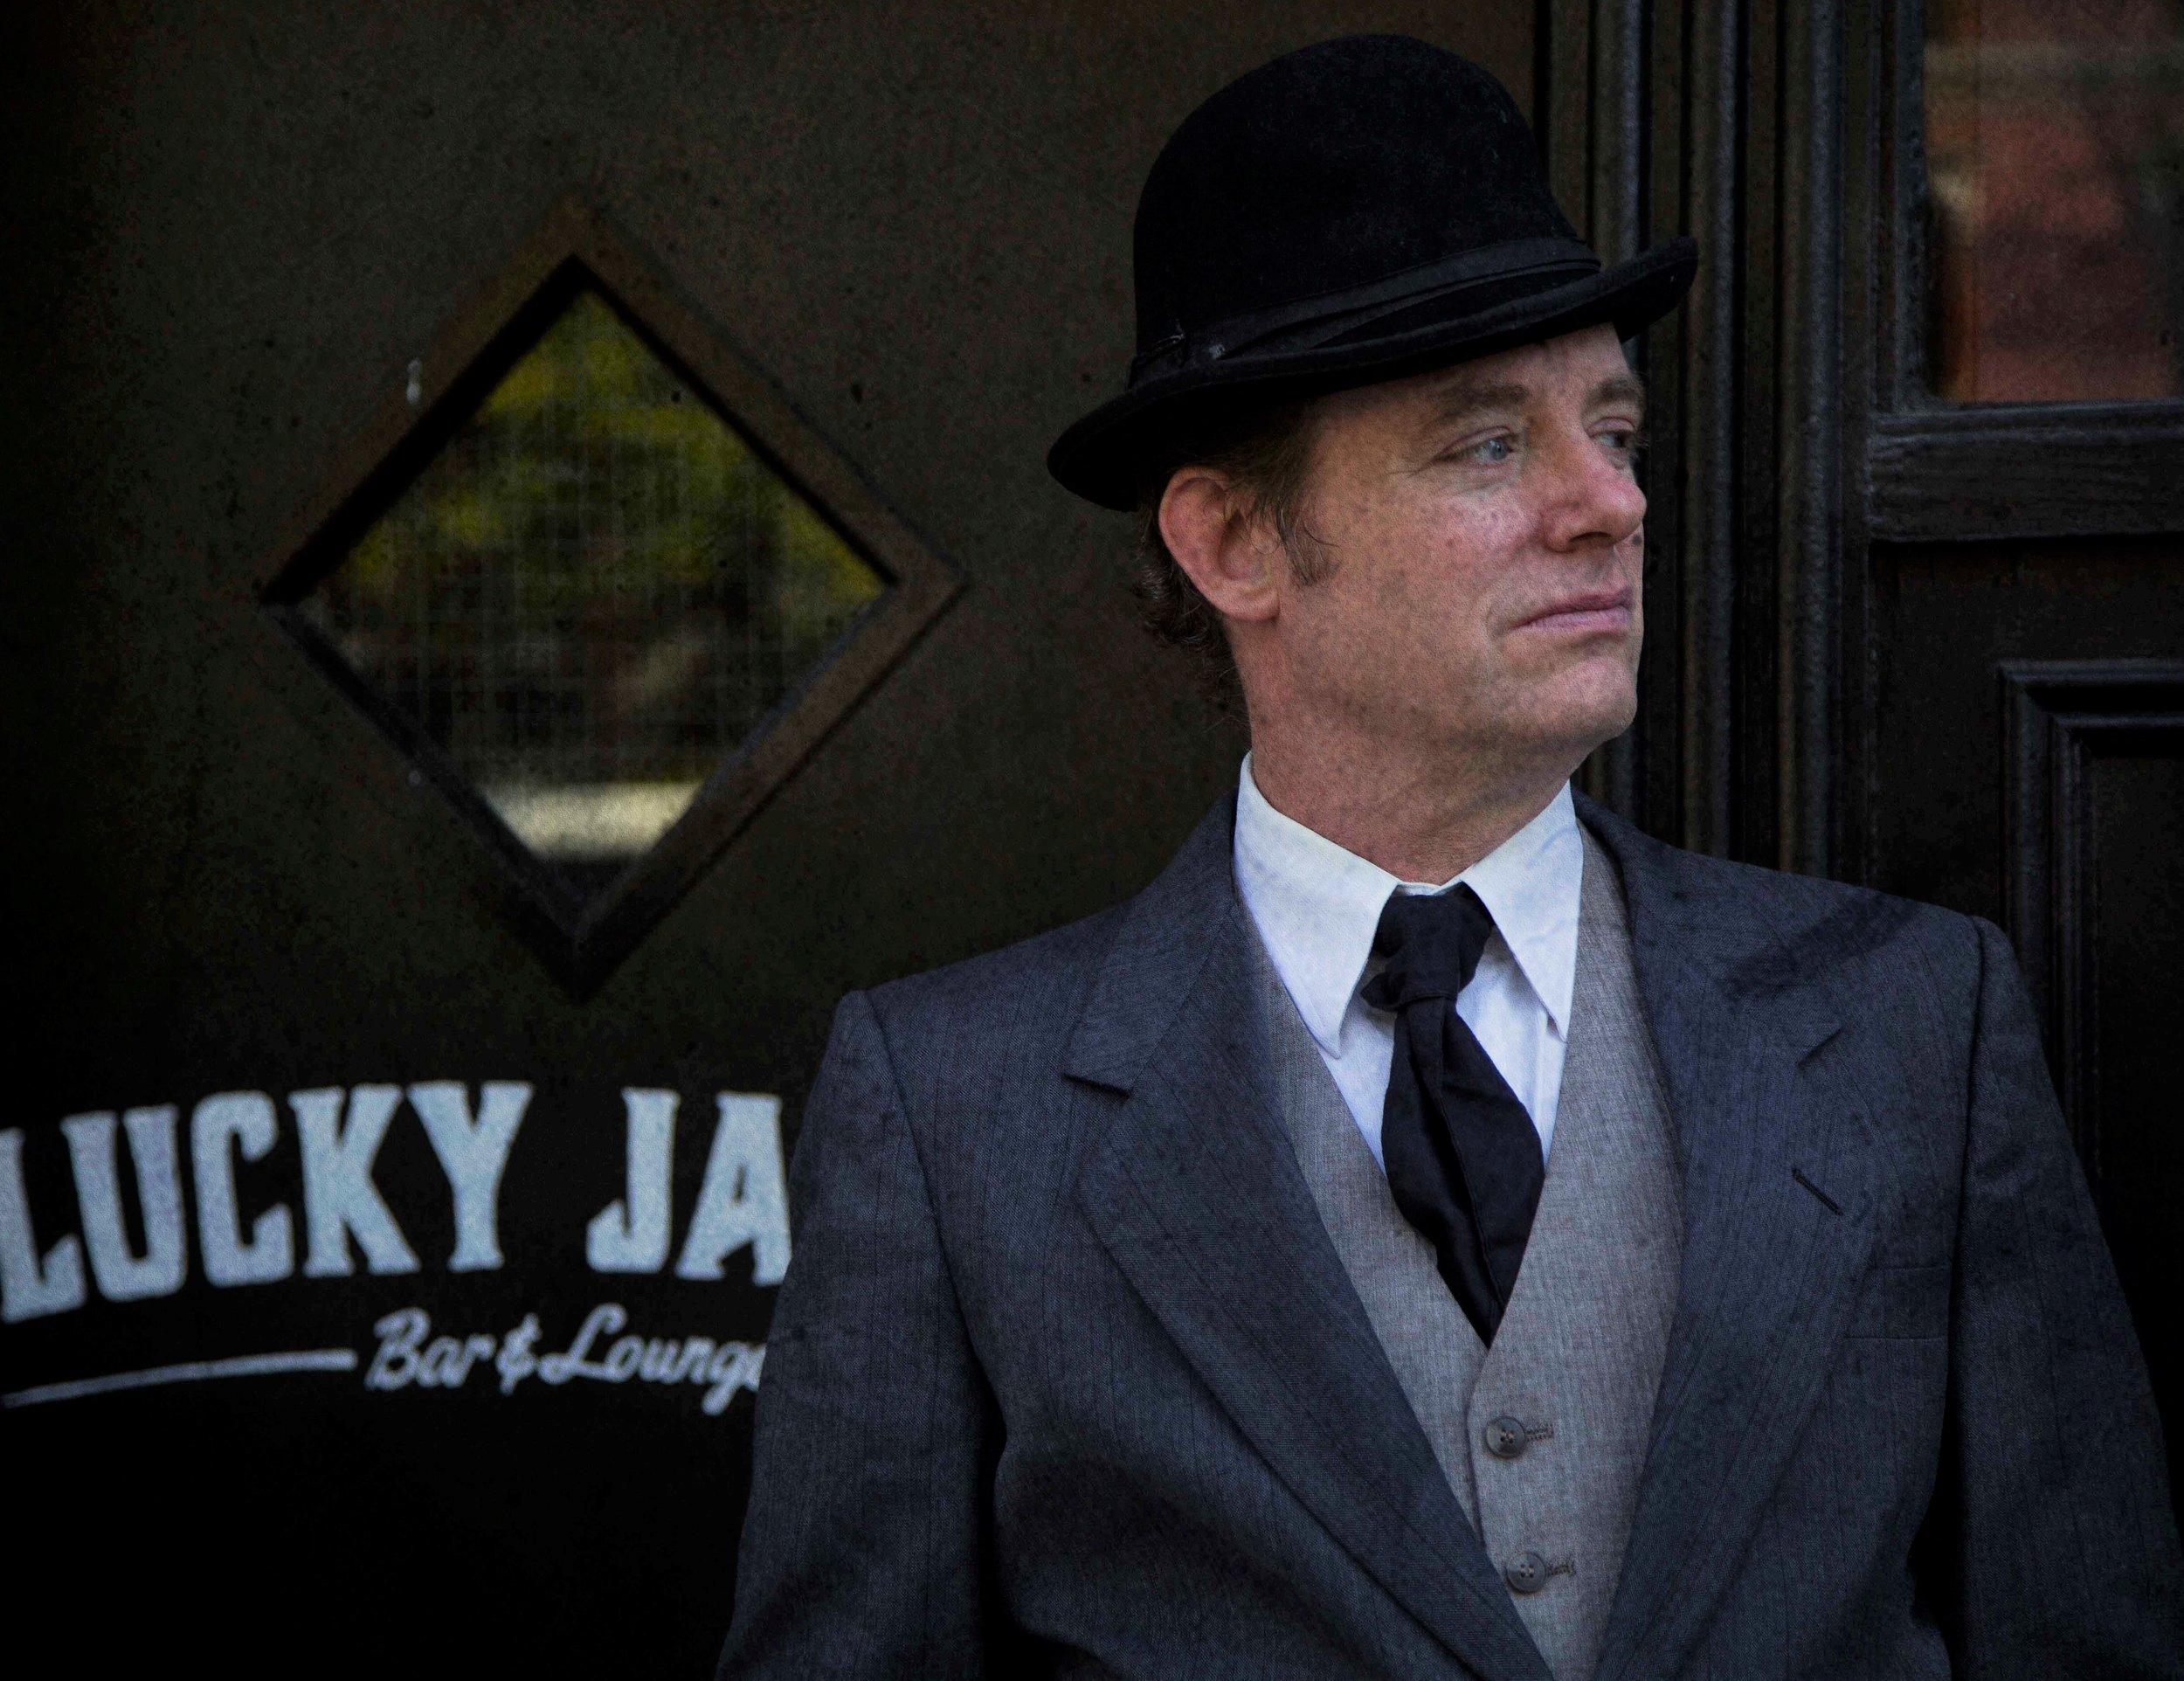 Top: Tom Staggs as the prosecutor. Photos by Natalia Yandyganova